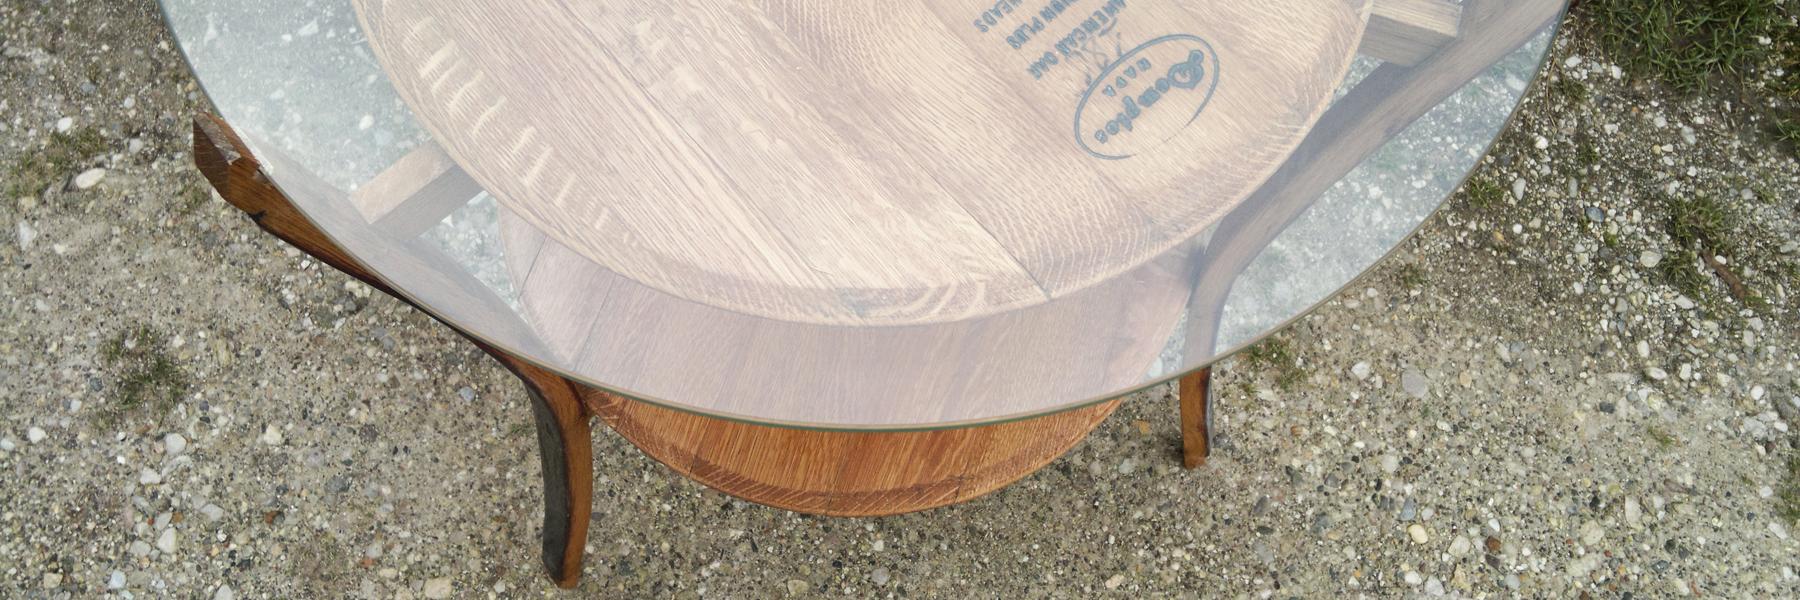 Tavolino barrique